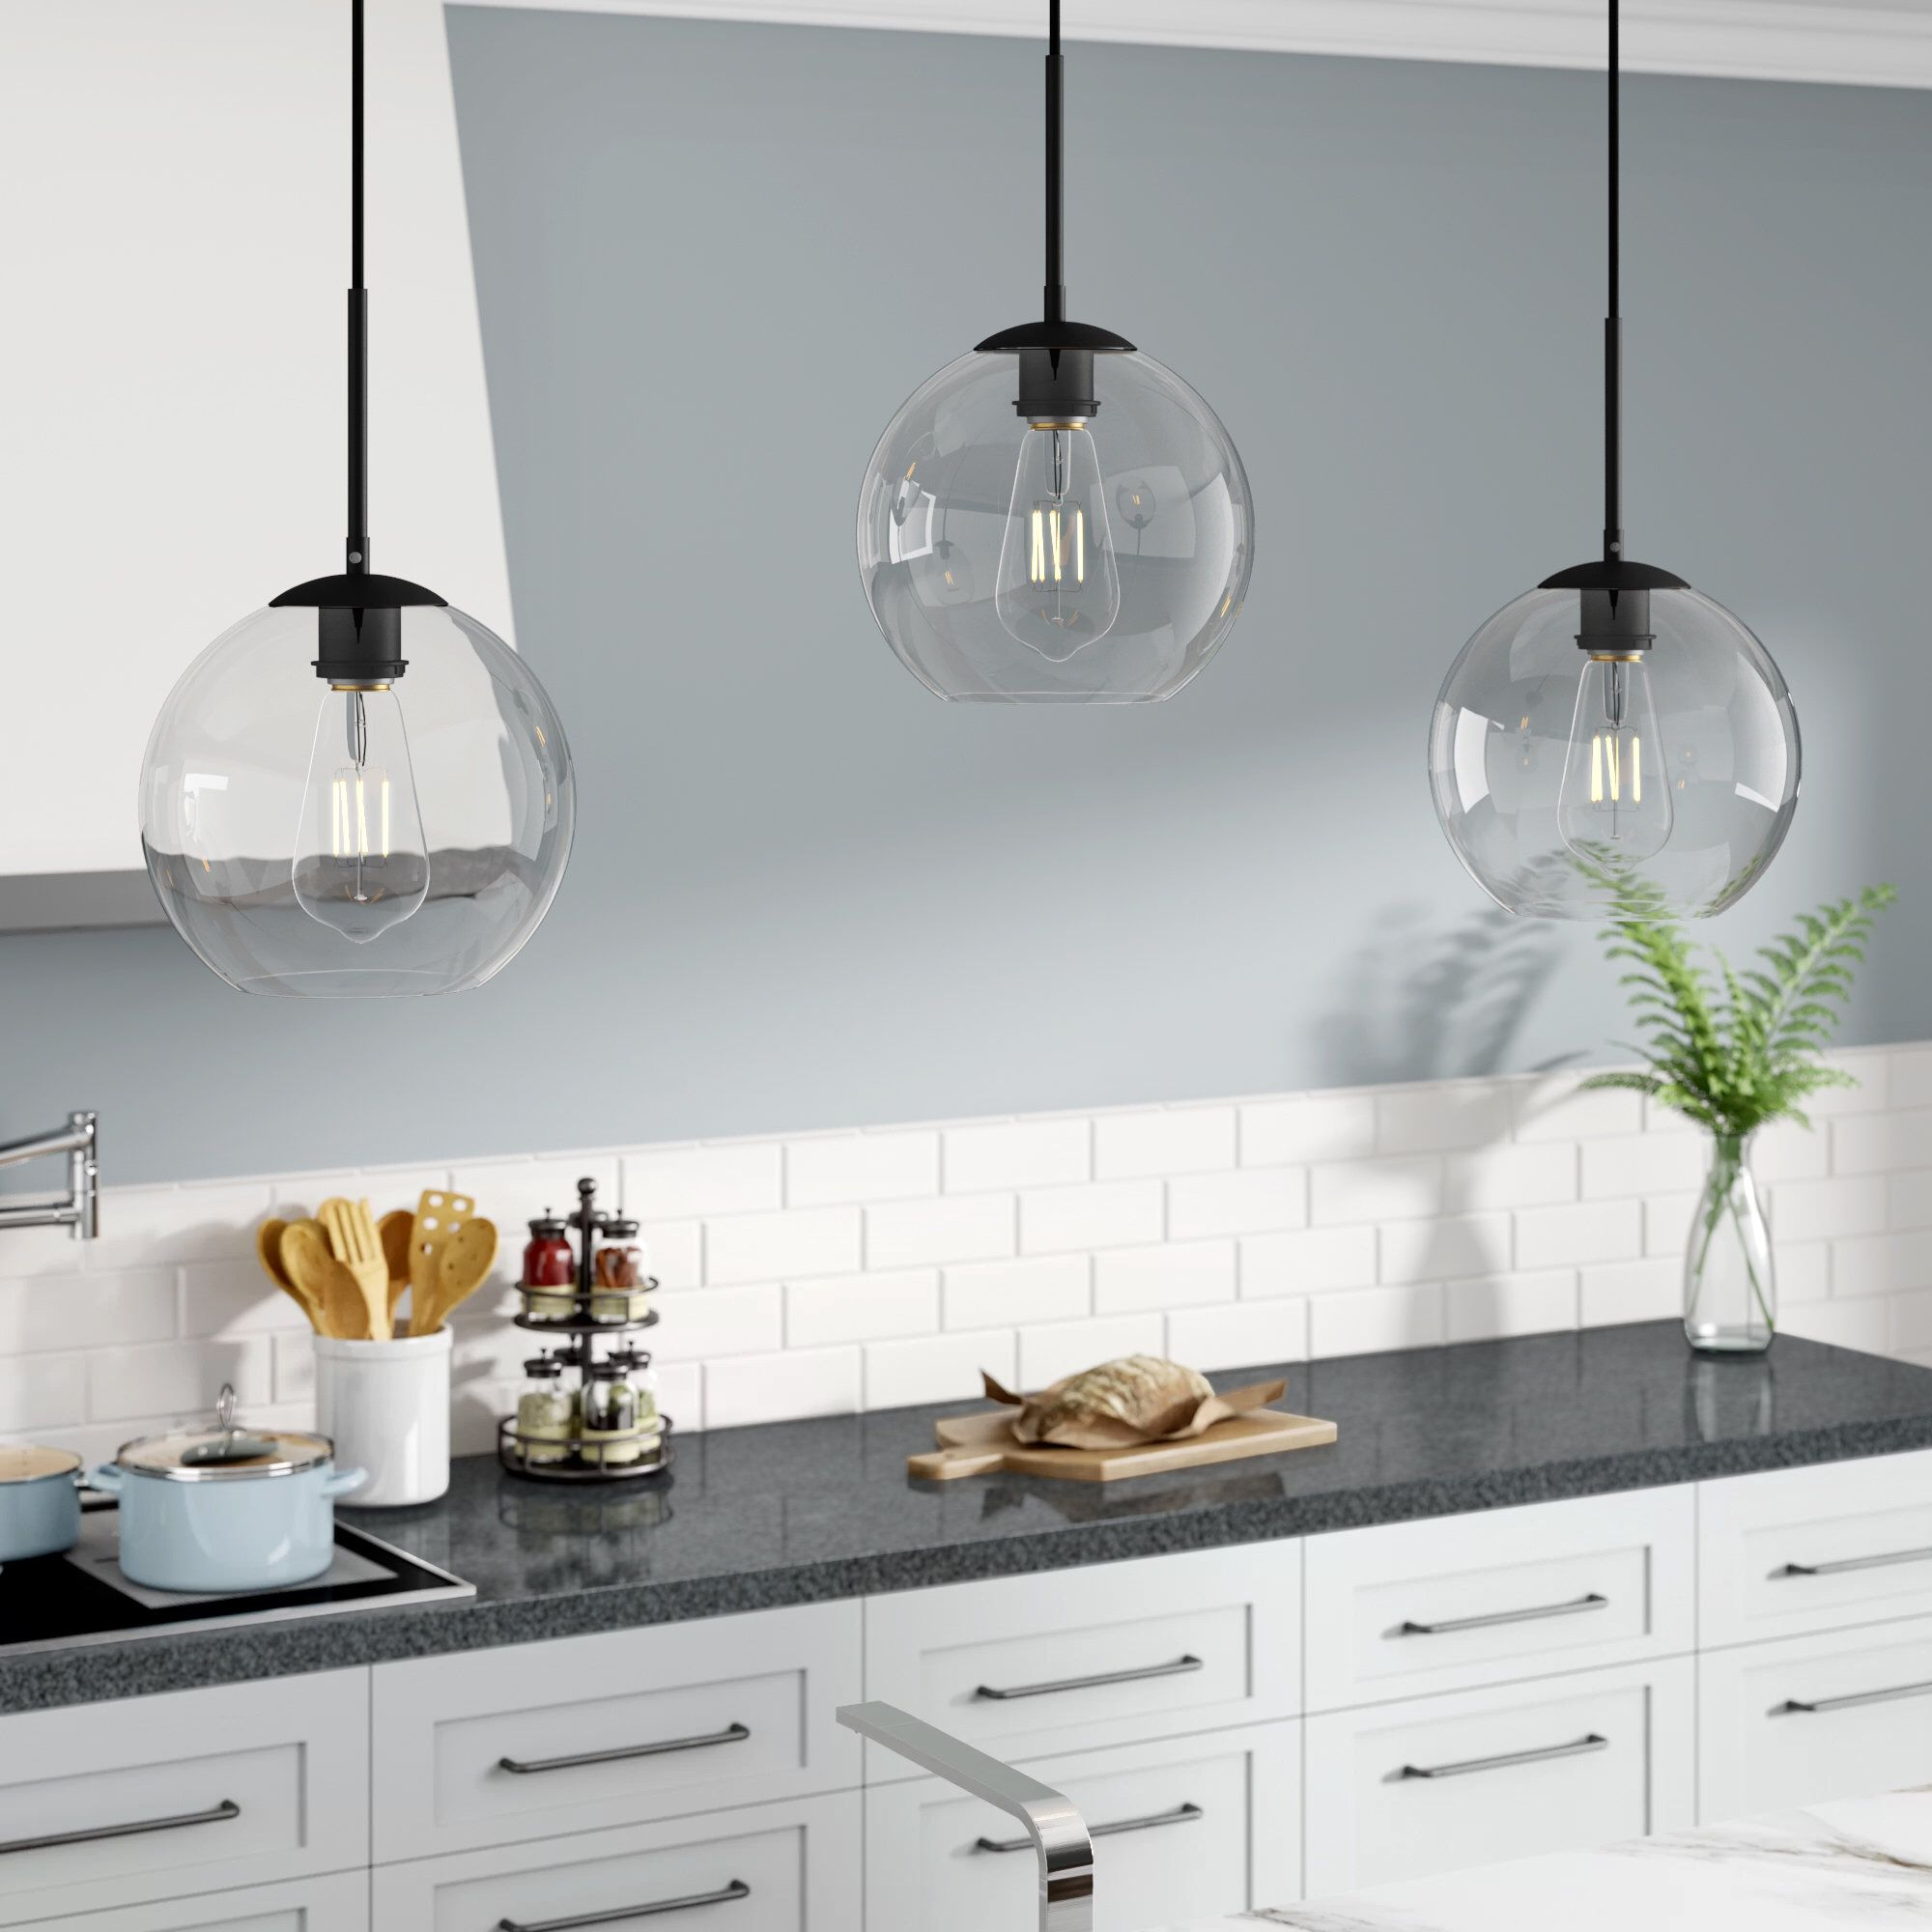 30+ Three pendant kitchen light information